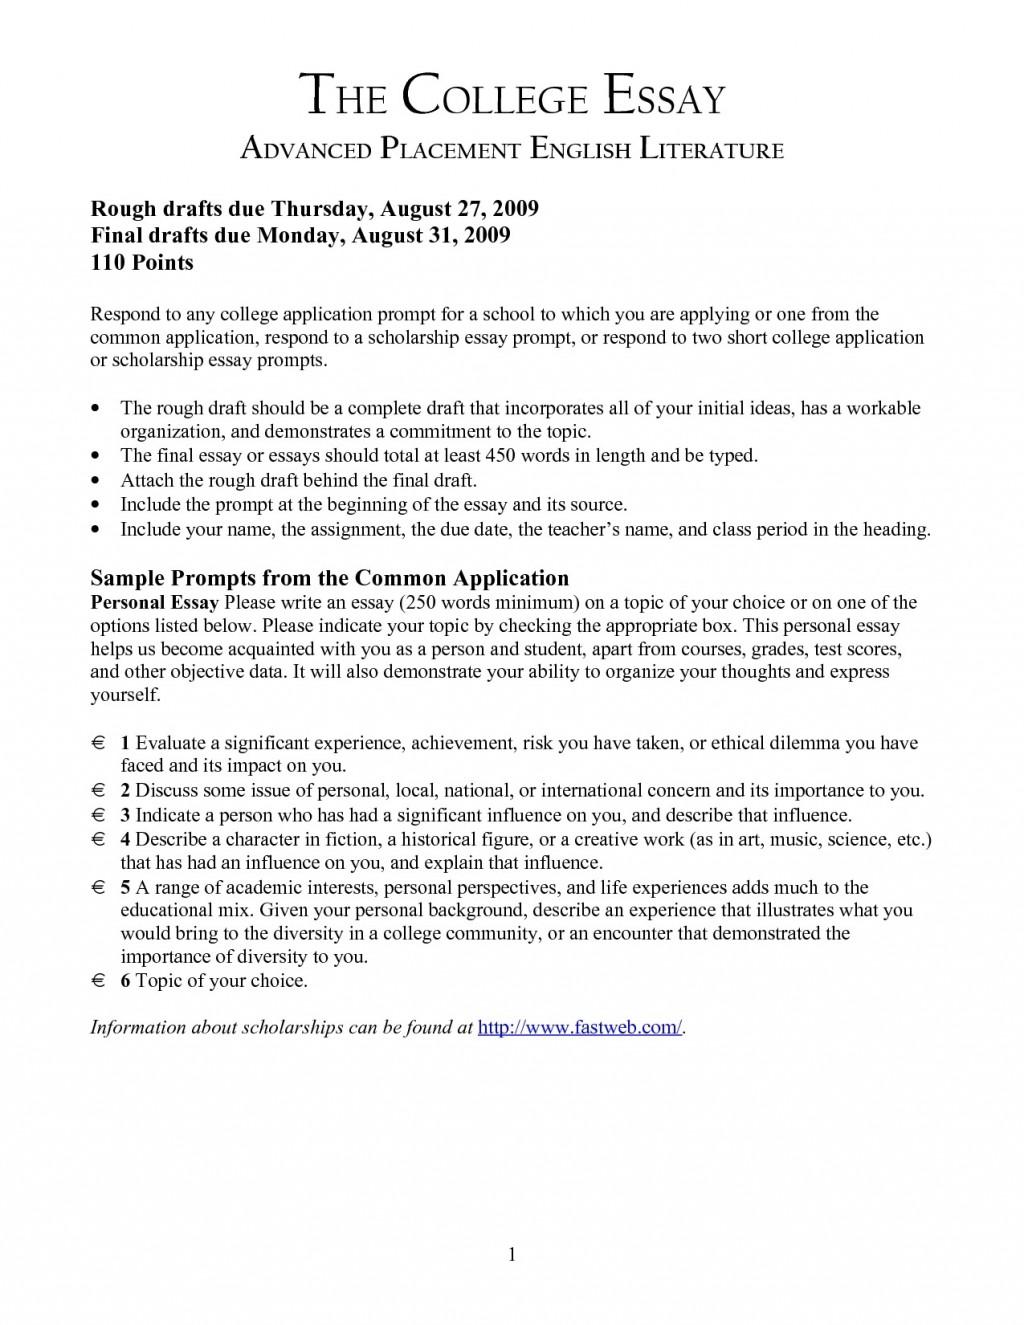 015 Essay Example Winning Scholarship Examples College Application Format World Of Award Writing Nardellidesign Pertai Nursing Stupendous Pdf Large